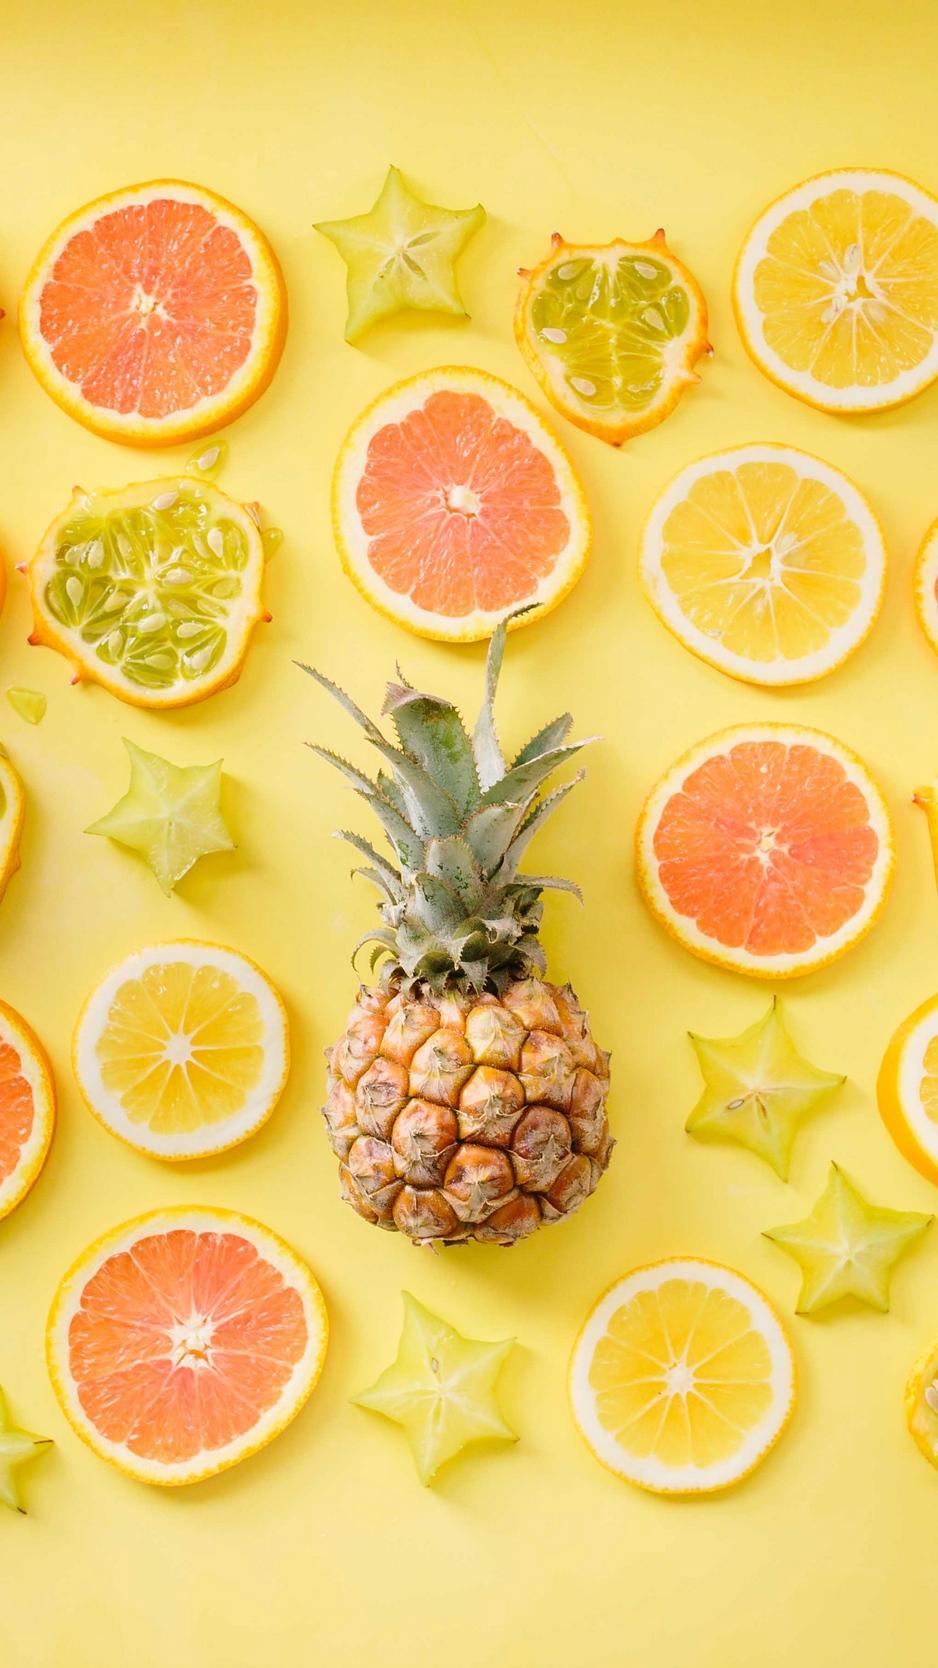 92 923506 wallpaper fruit citrus pineapple yellow lemon lemon yellow